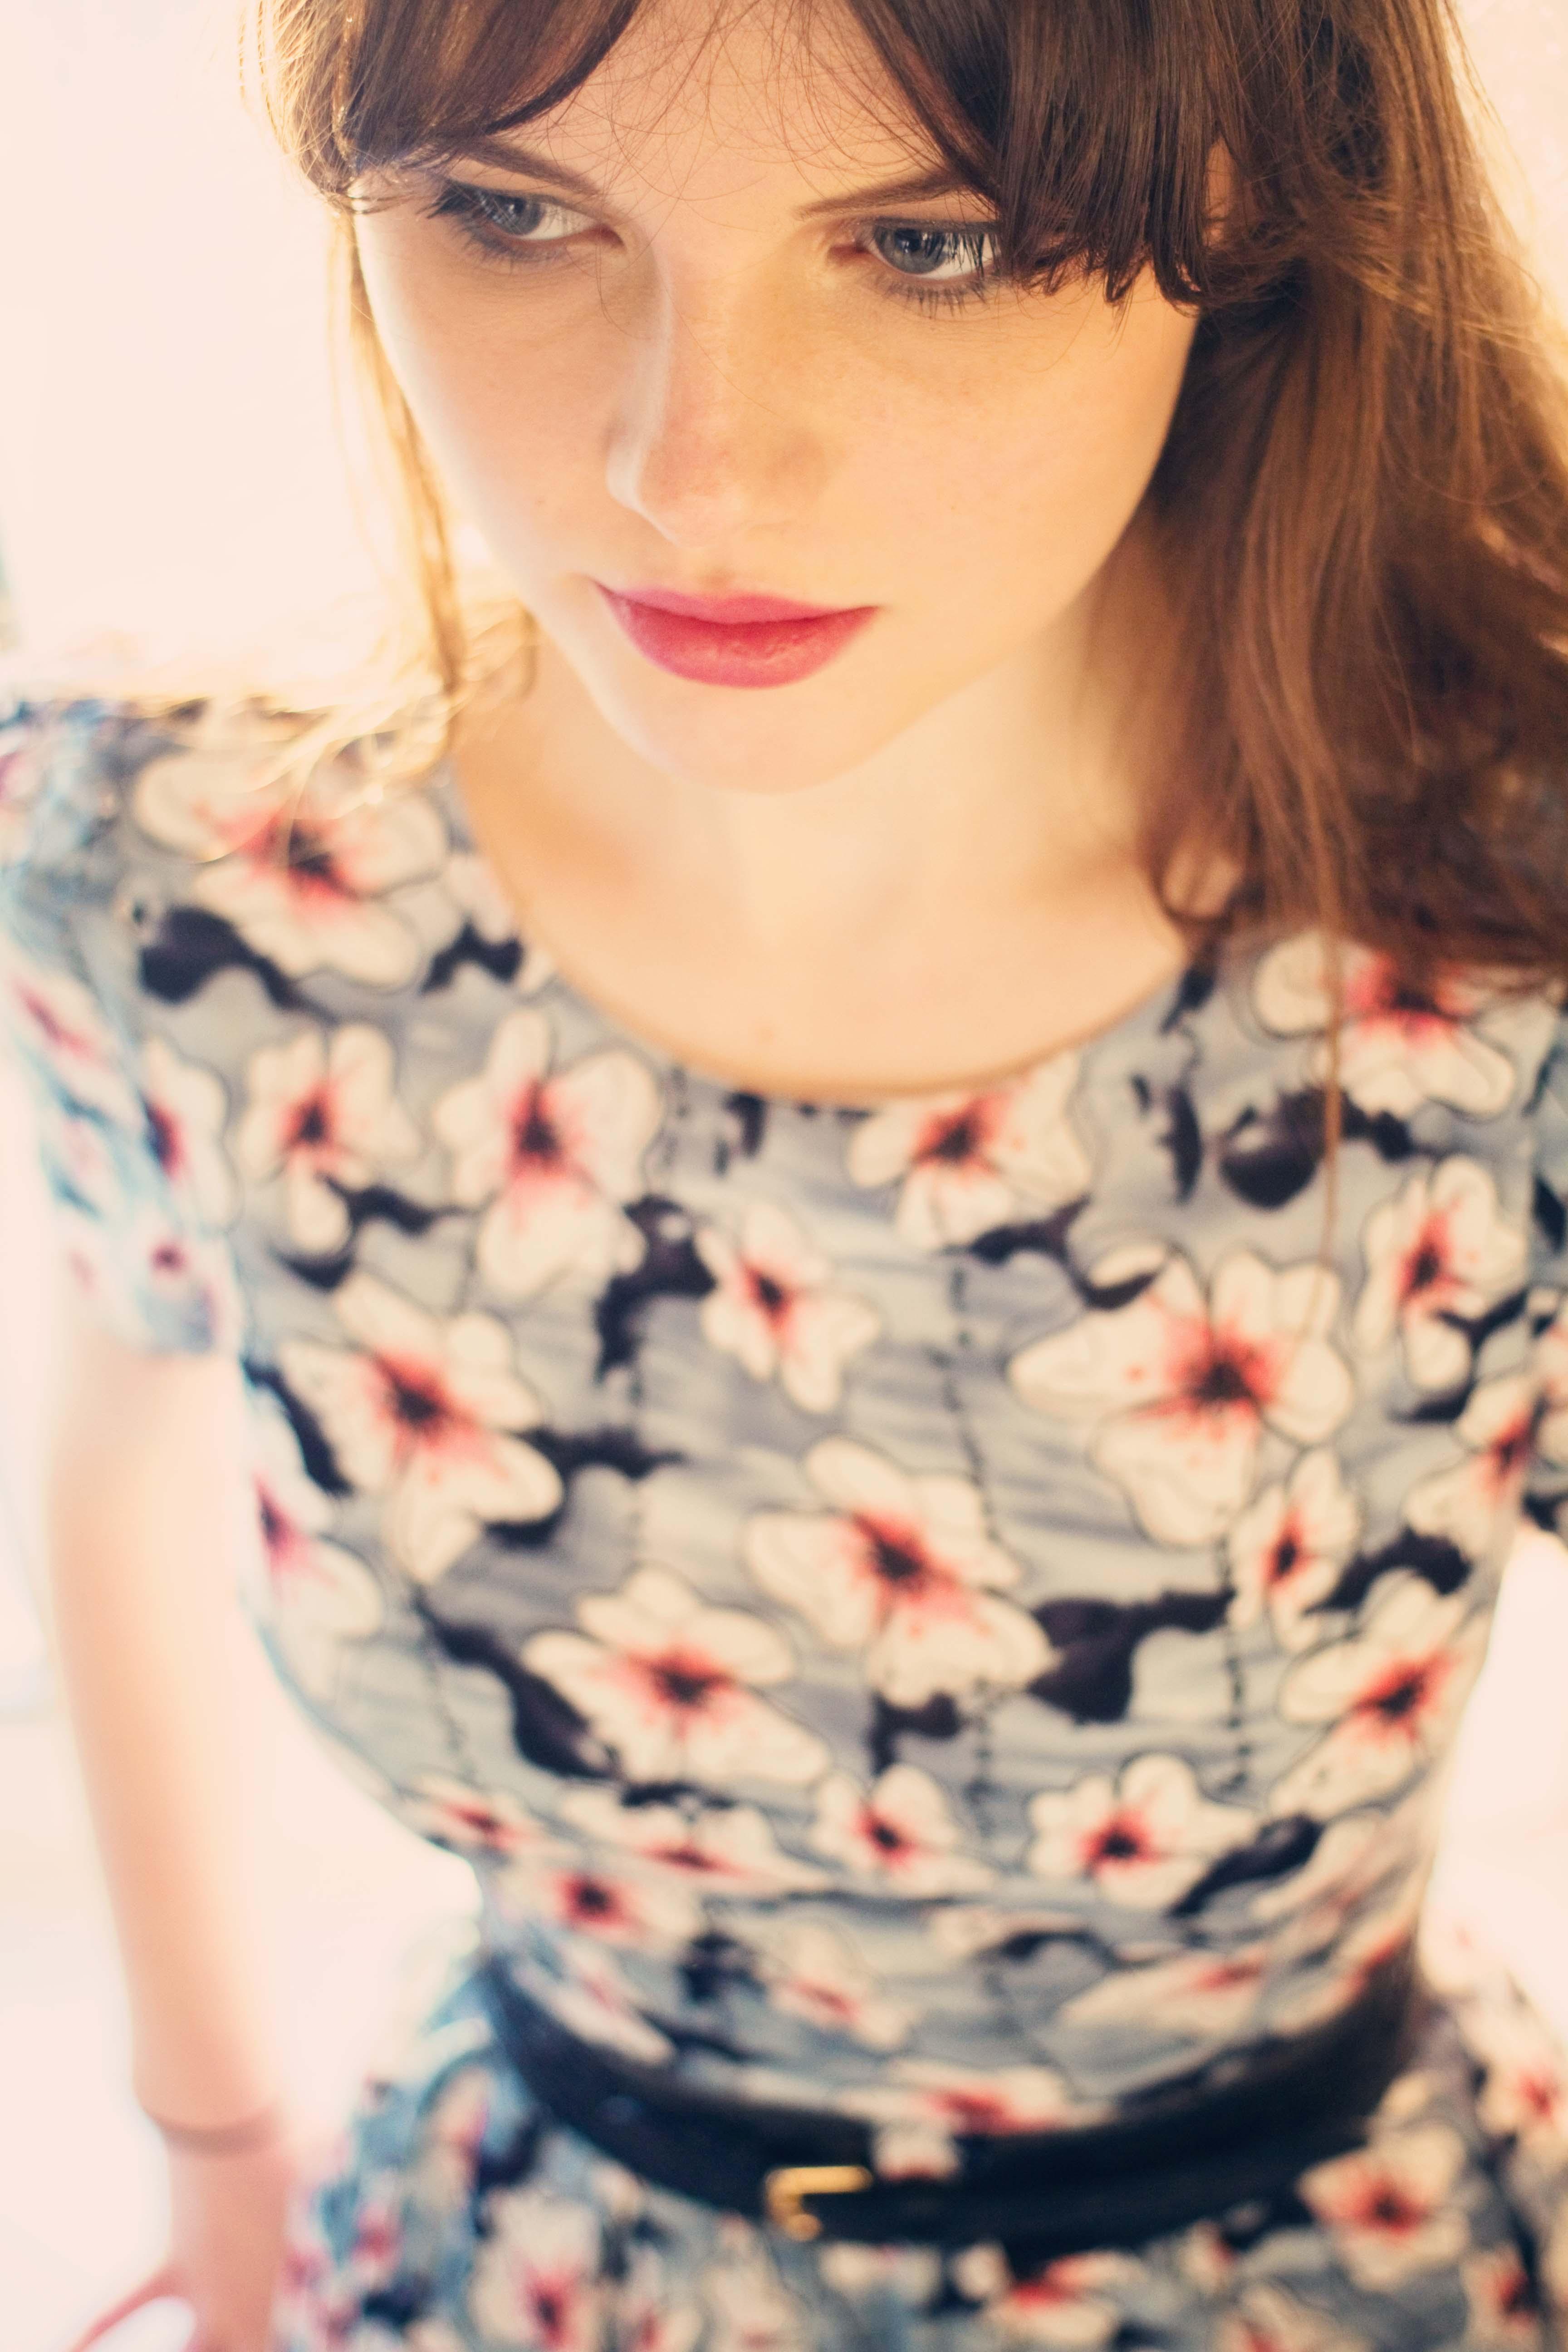 Teen blogger wearing grey floral dress and plum lipstick